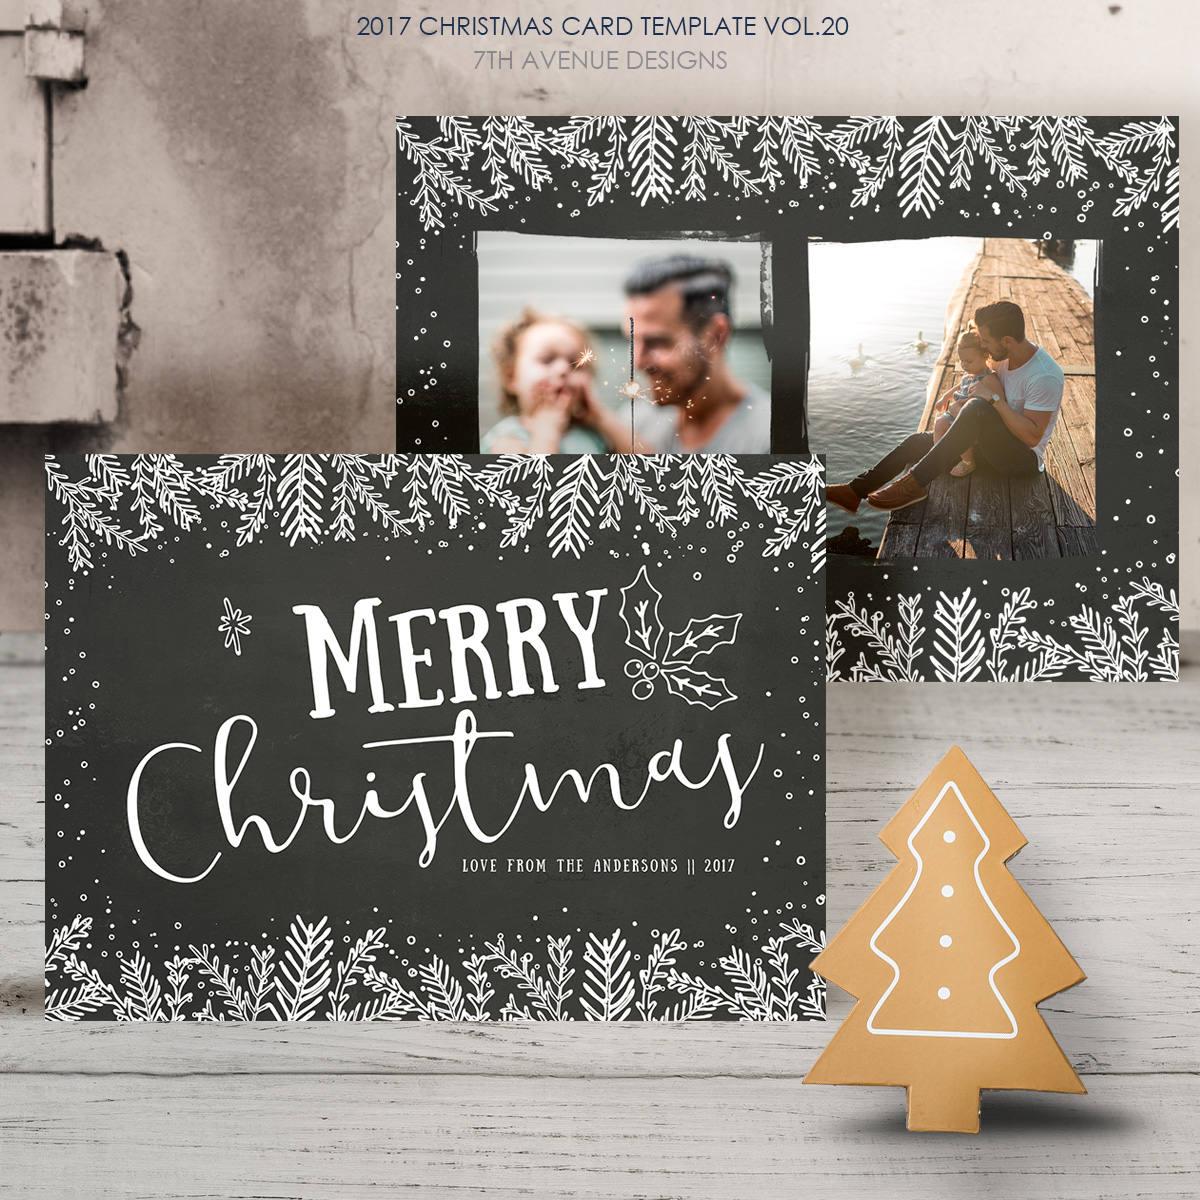 2017 Christmas Card Templates Vol.20 7x5 Inch Card